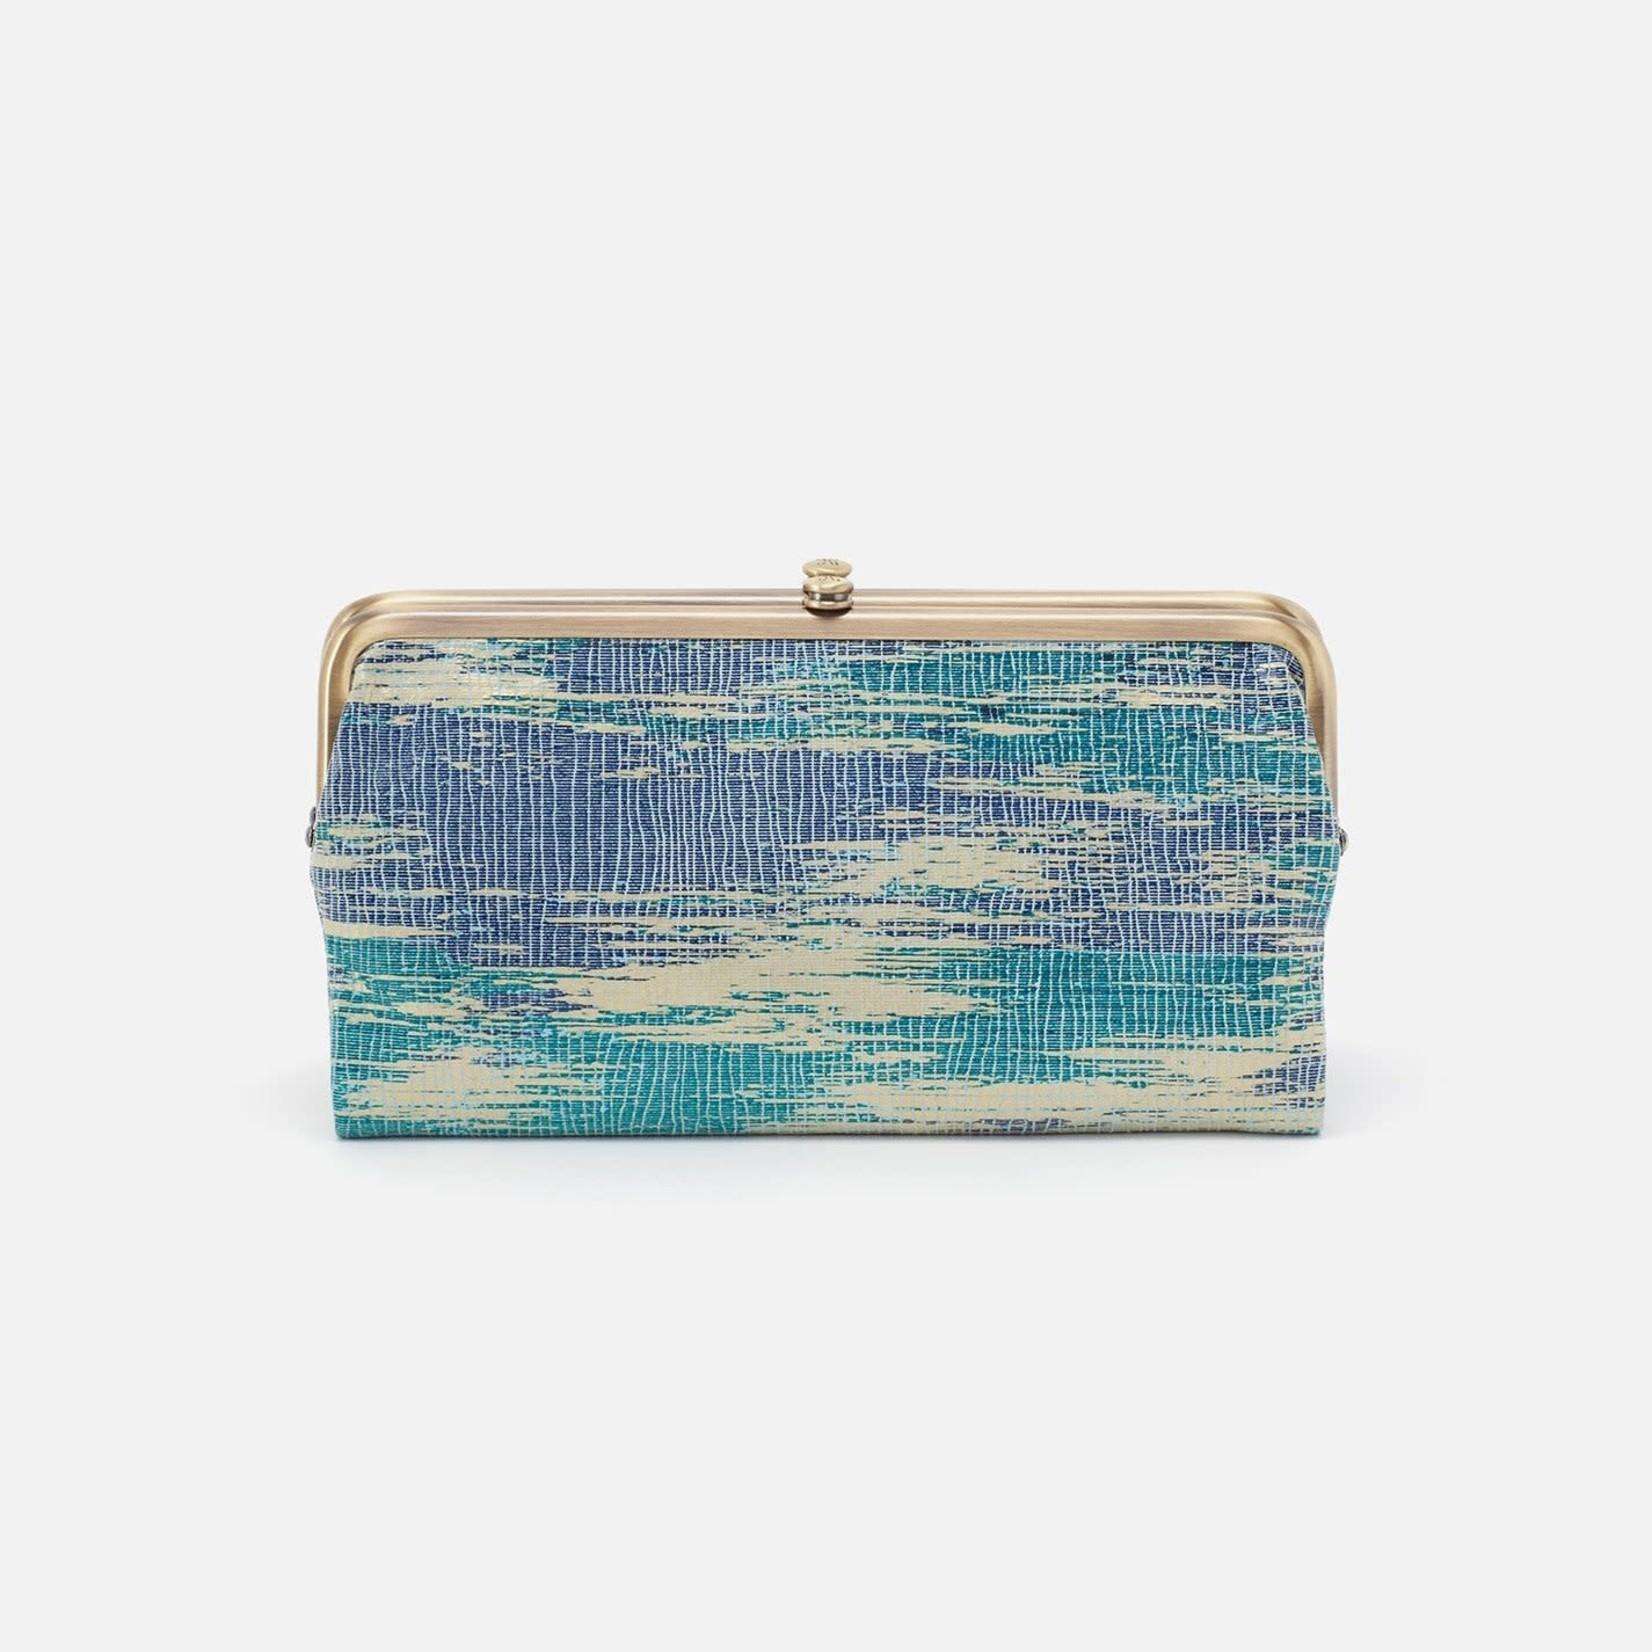 HOBO Lauren Crackd Glass Vintage Hide Leather Wallet